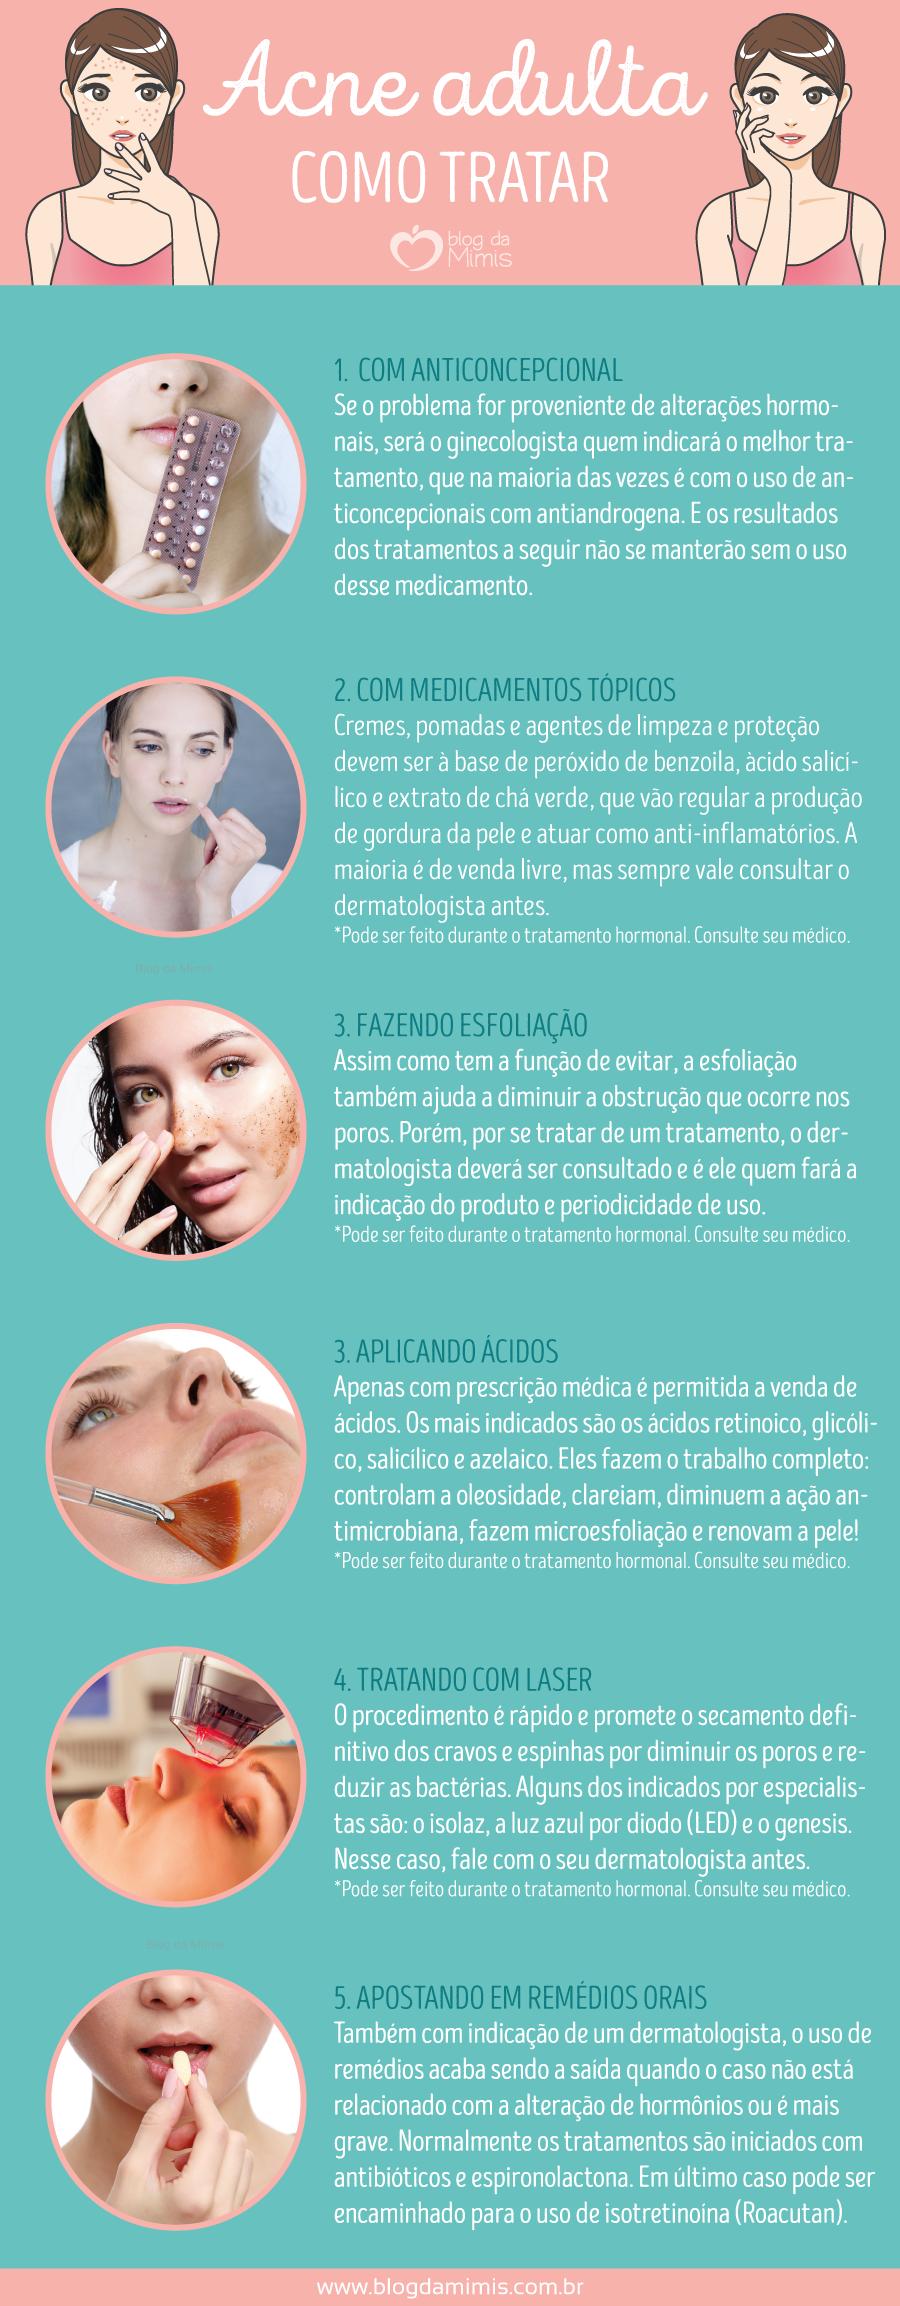 acne-blog-da-mimis-michelle-franzoni-post-02